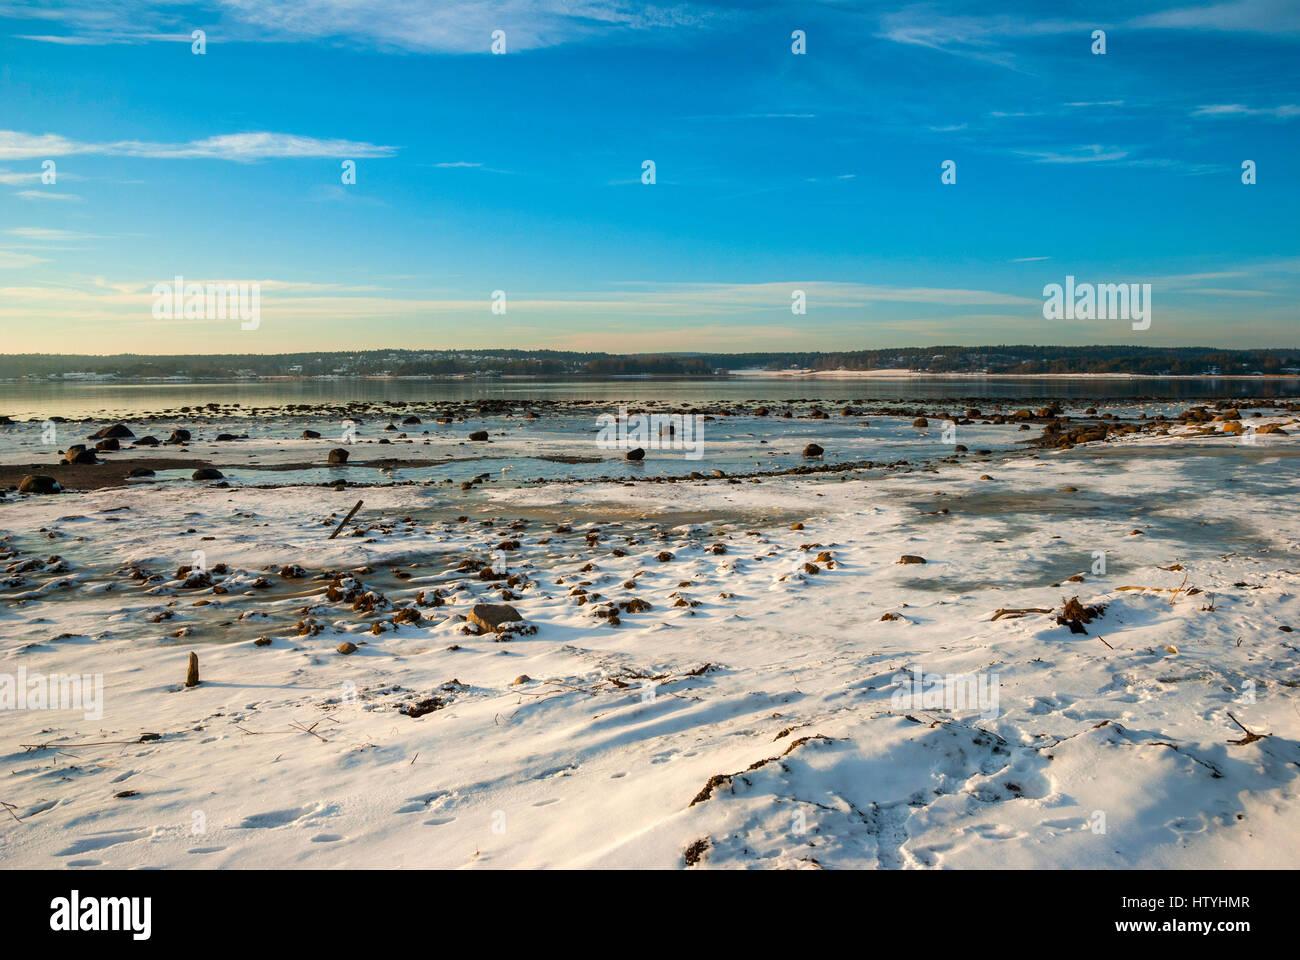 Frozen fjord in scandianvian winter, Norway - Stock Image